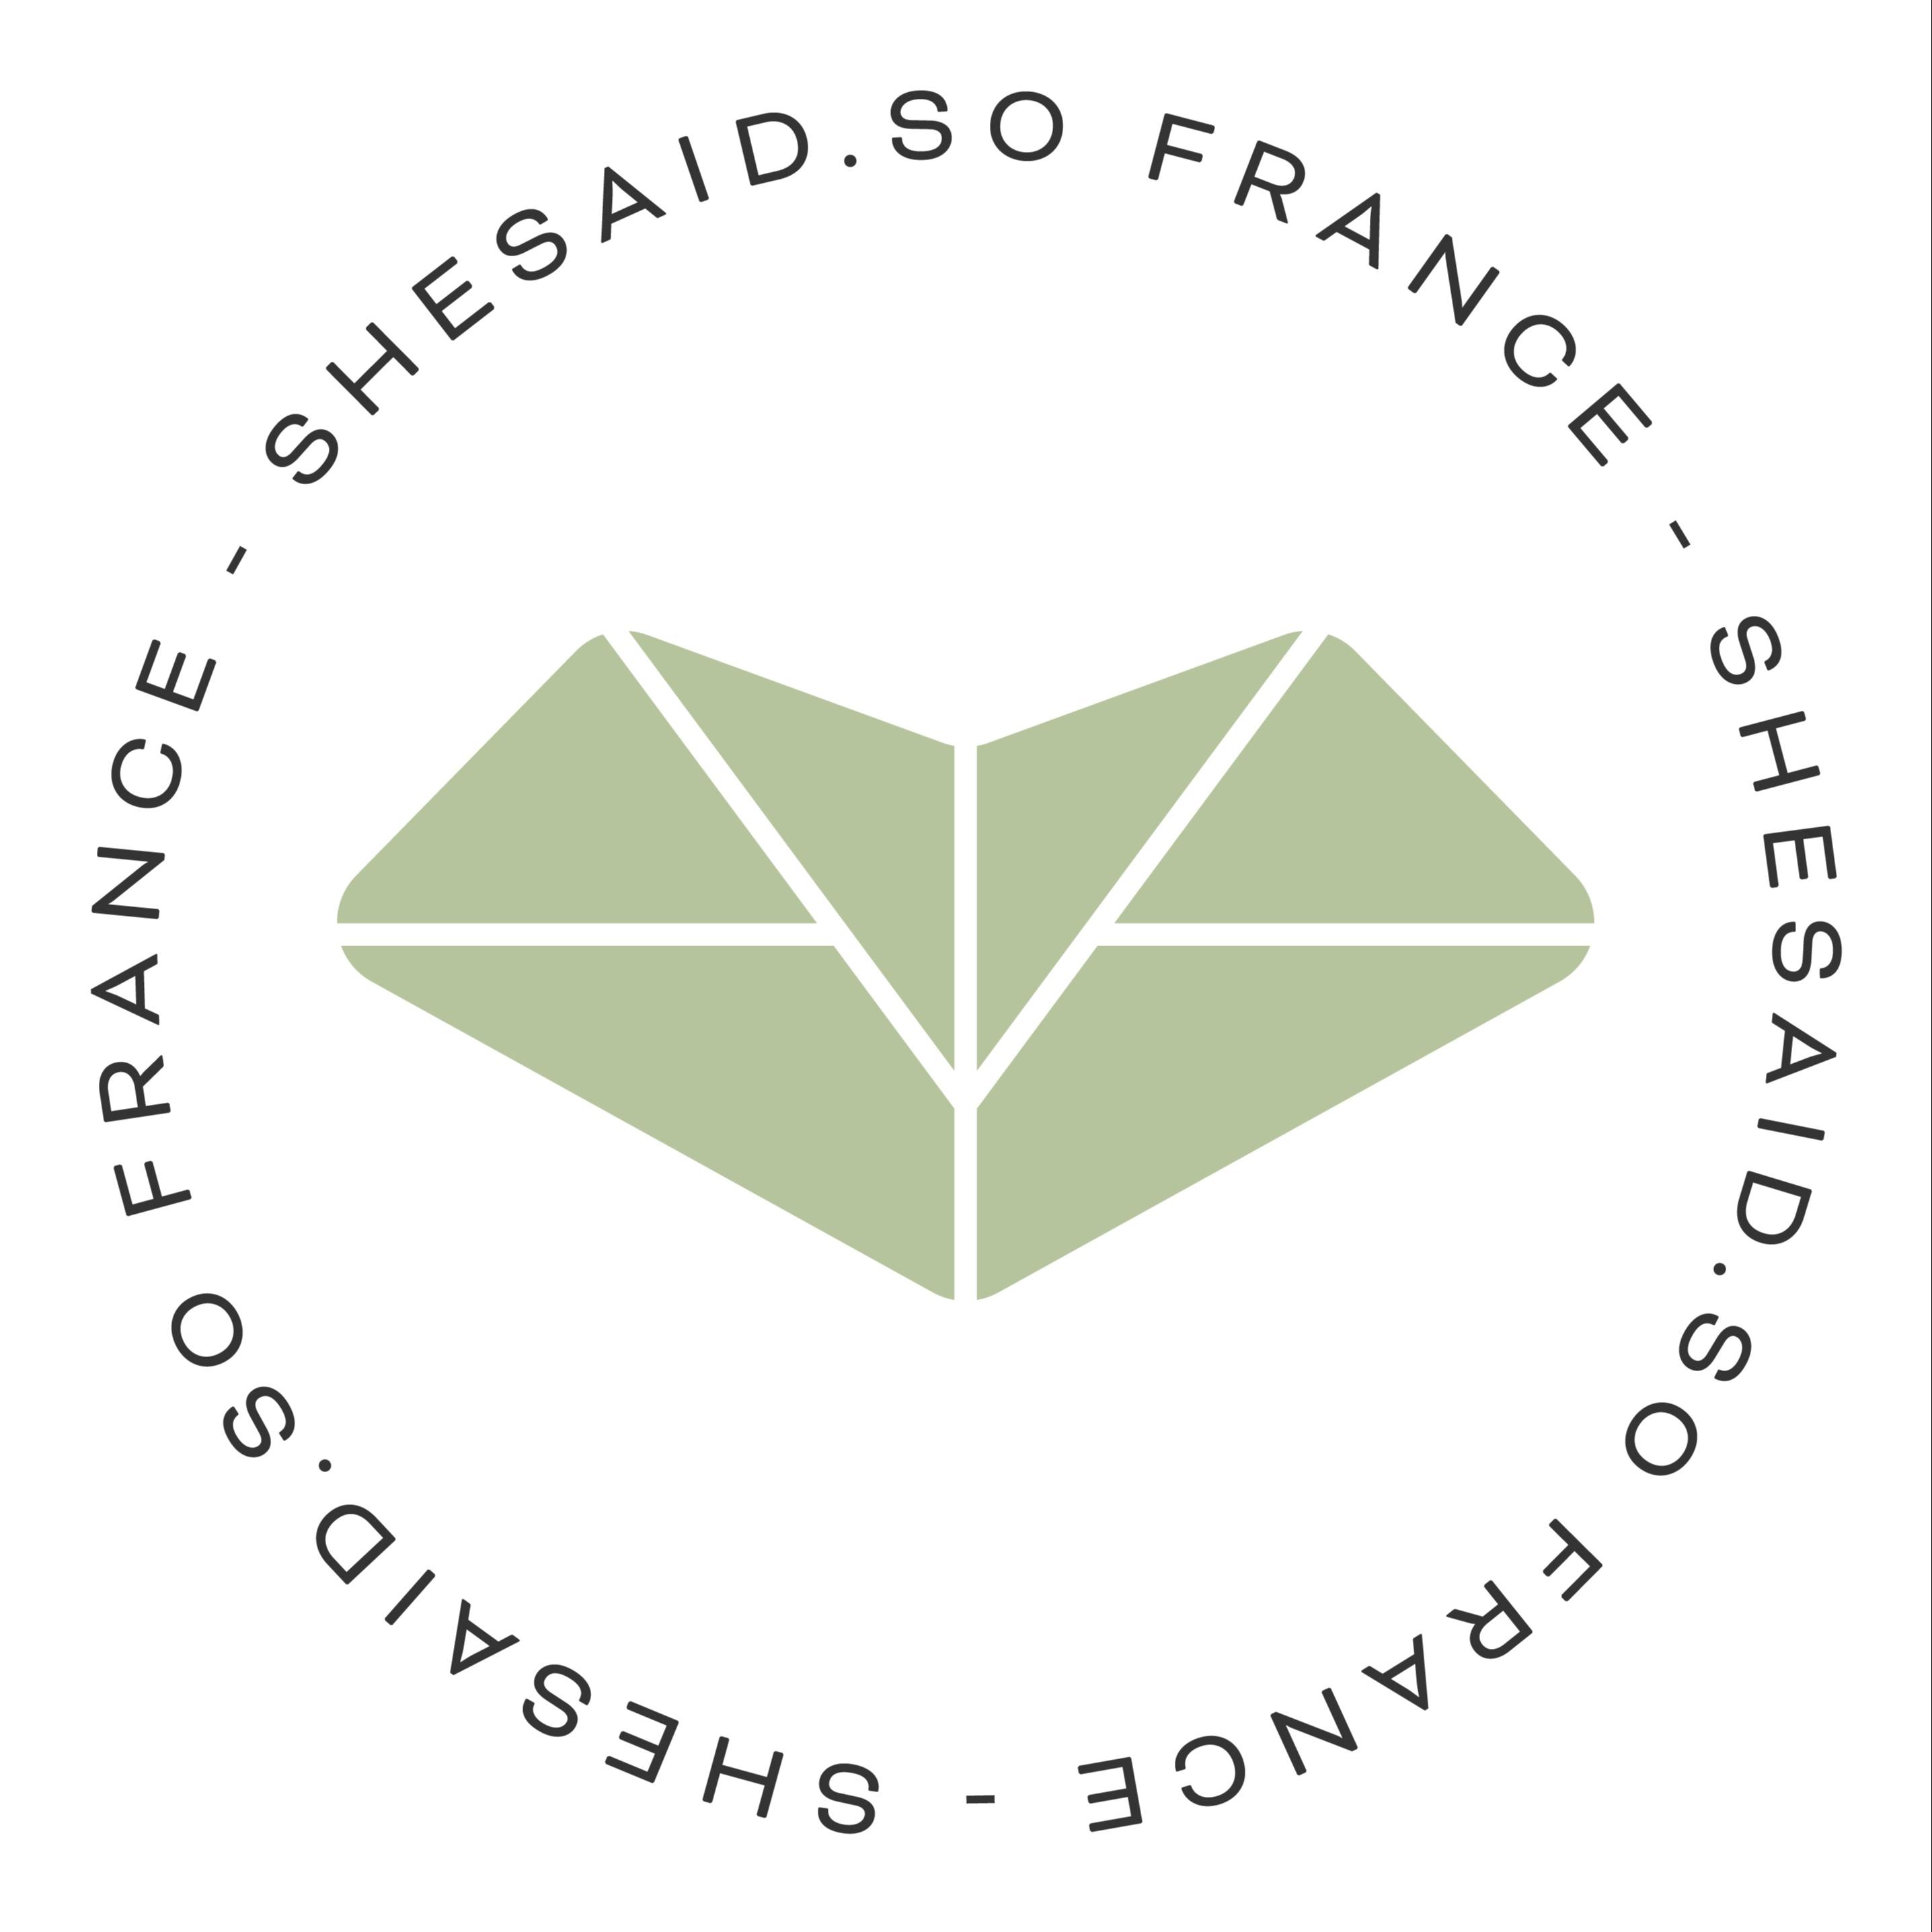 @shesaid.so_France Profile Image | Linktree